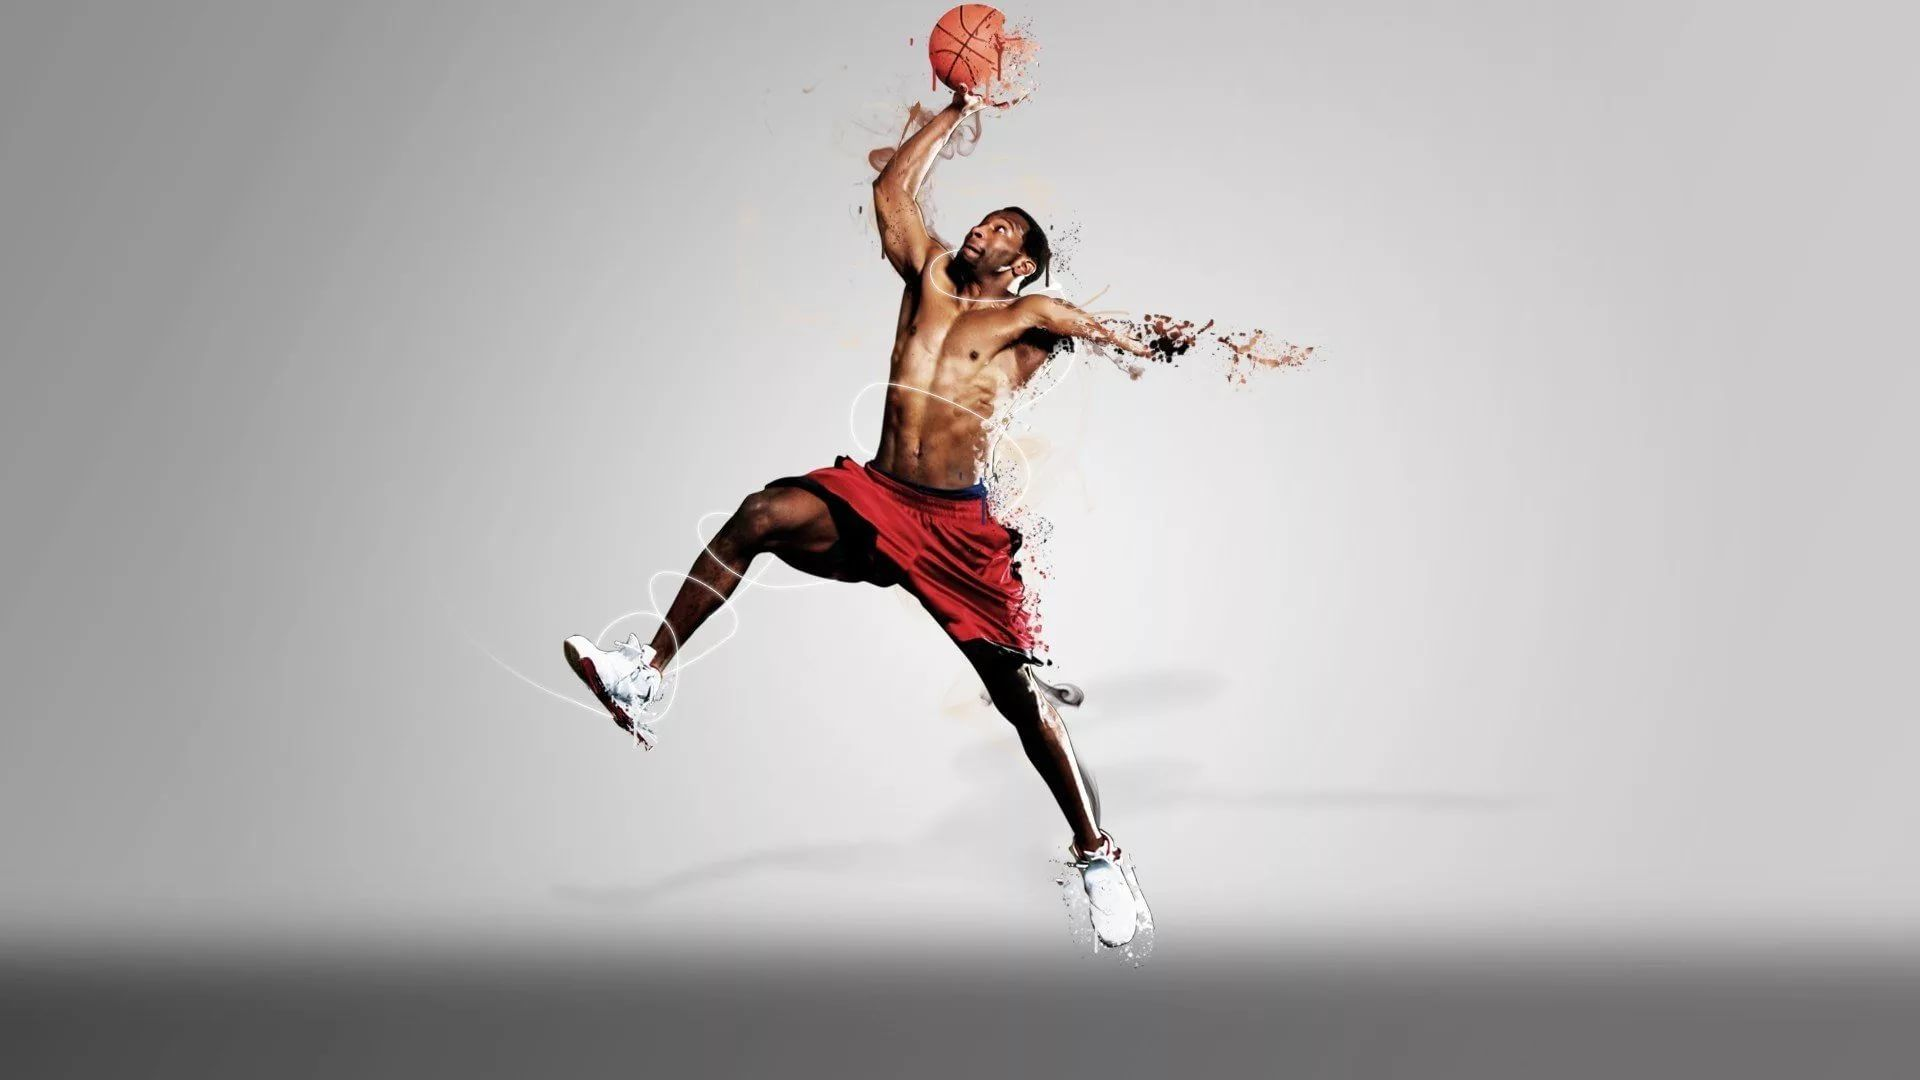 Nike Basketball PC Wallpaper